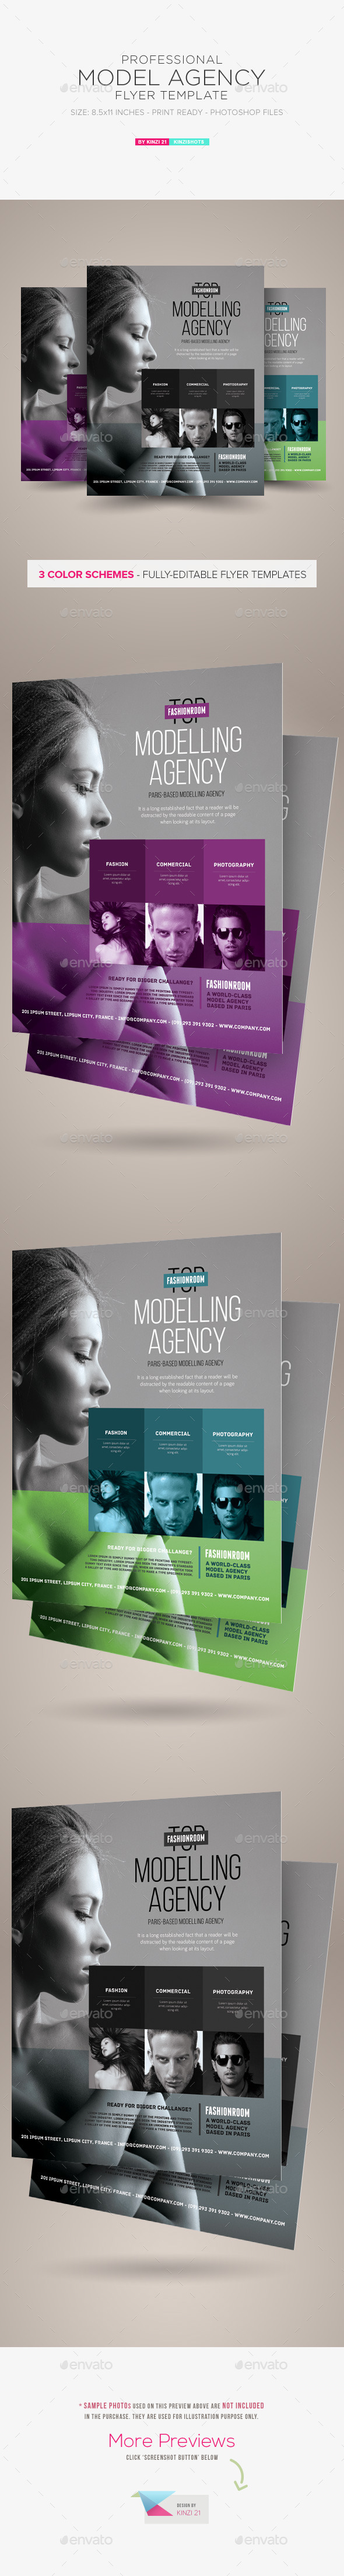 GraphicRiver Model Agency Flyer 10111142